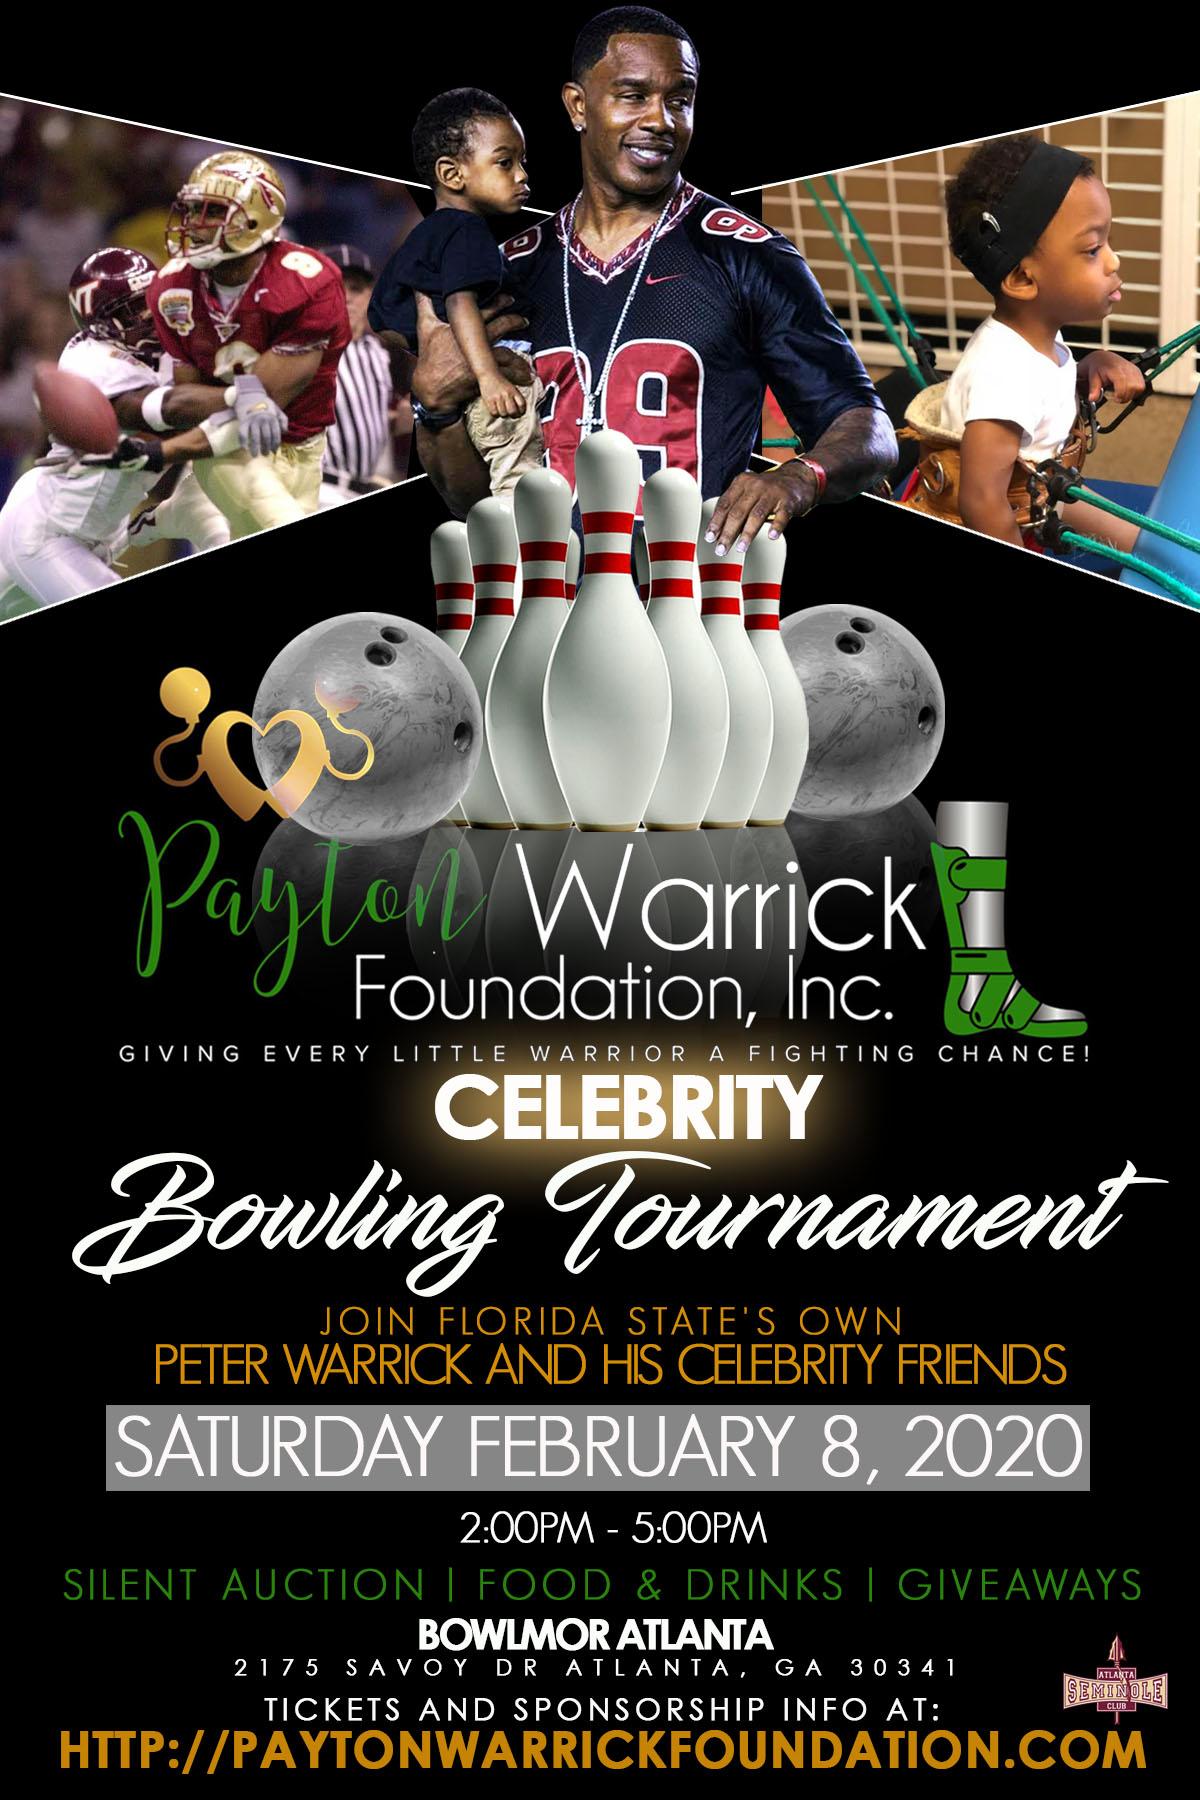 PWF Celebrity Bowling Tournament